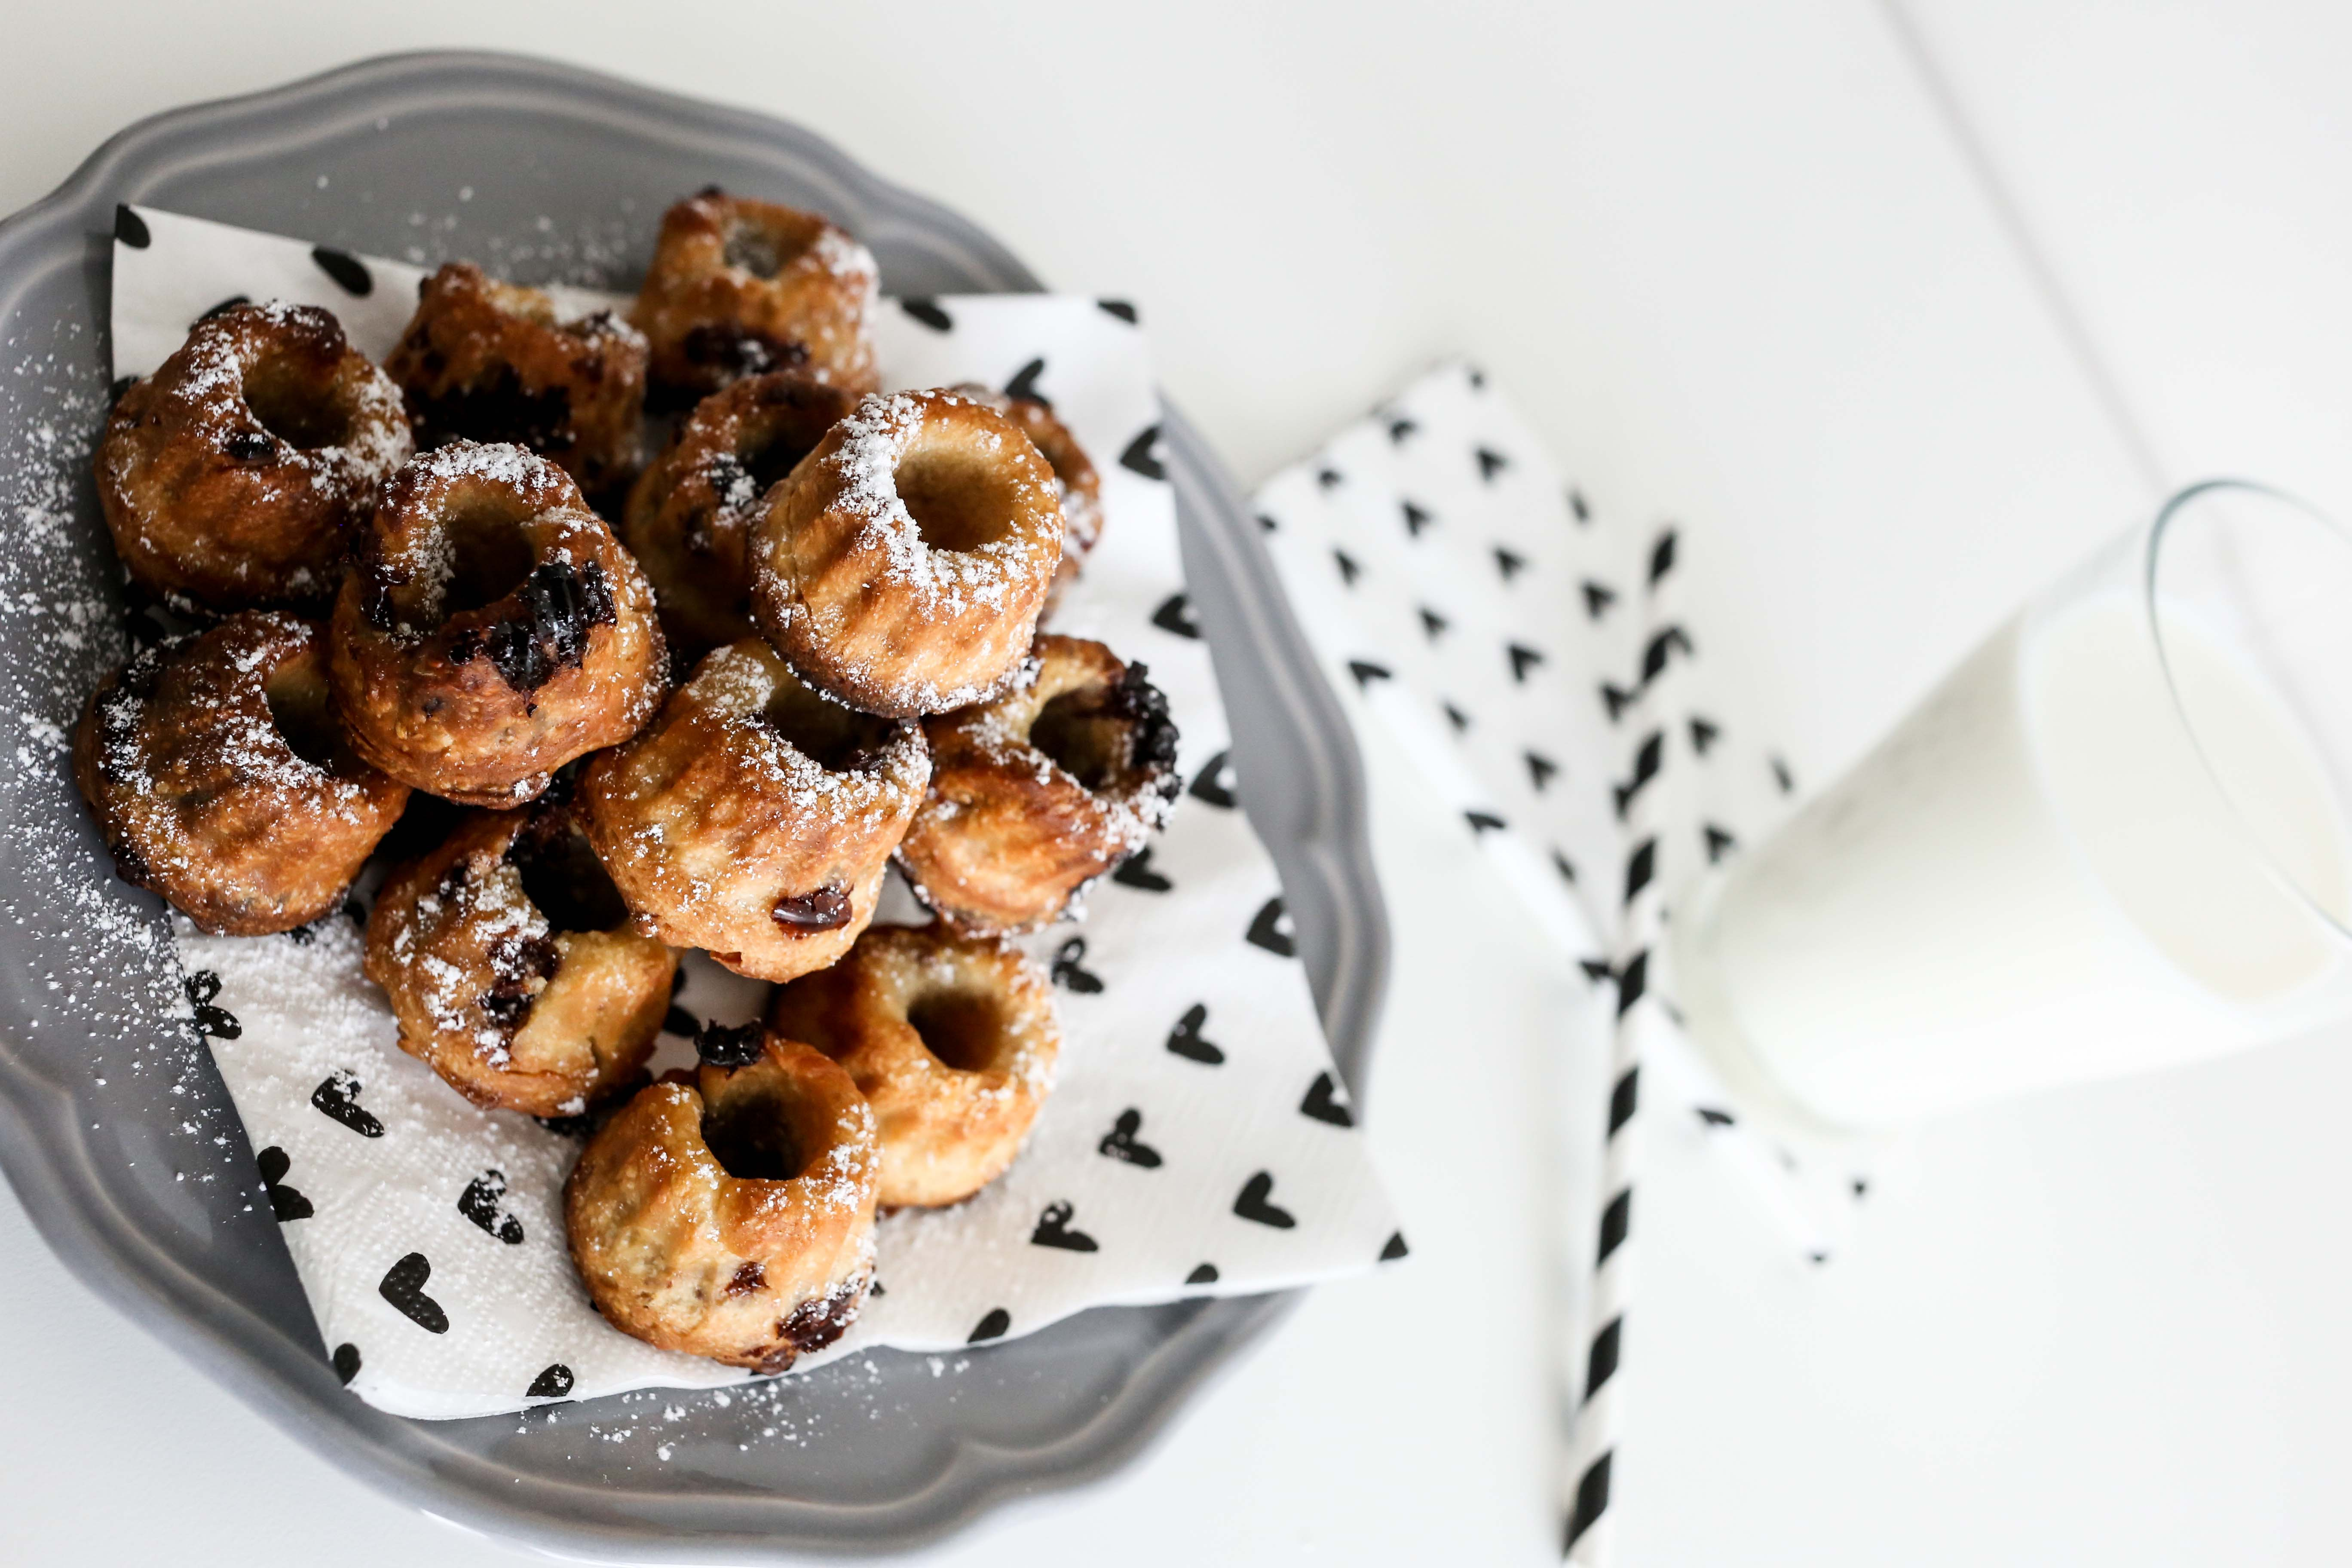 mini-gugel-hupf-schoko-brioche-kleines-dessert-rezept_2542